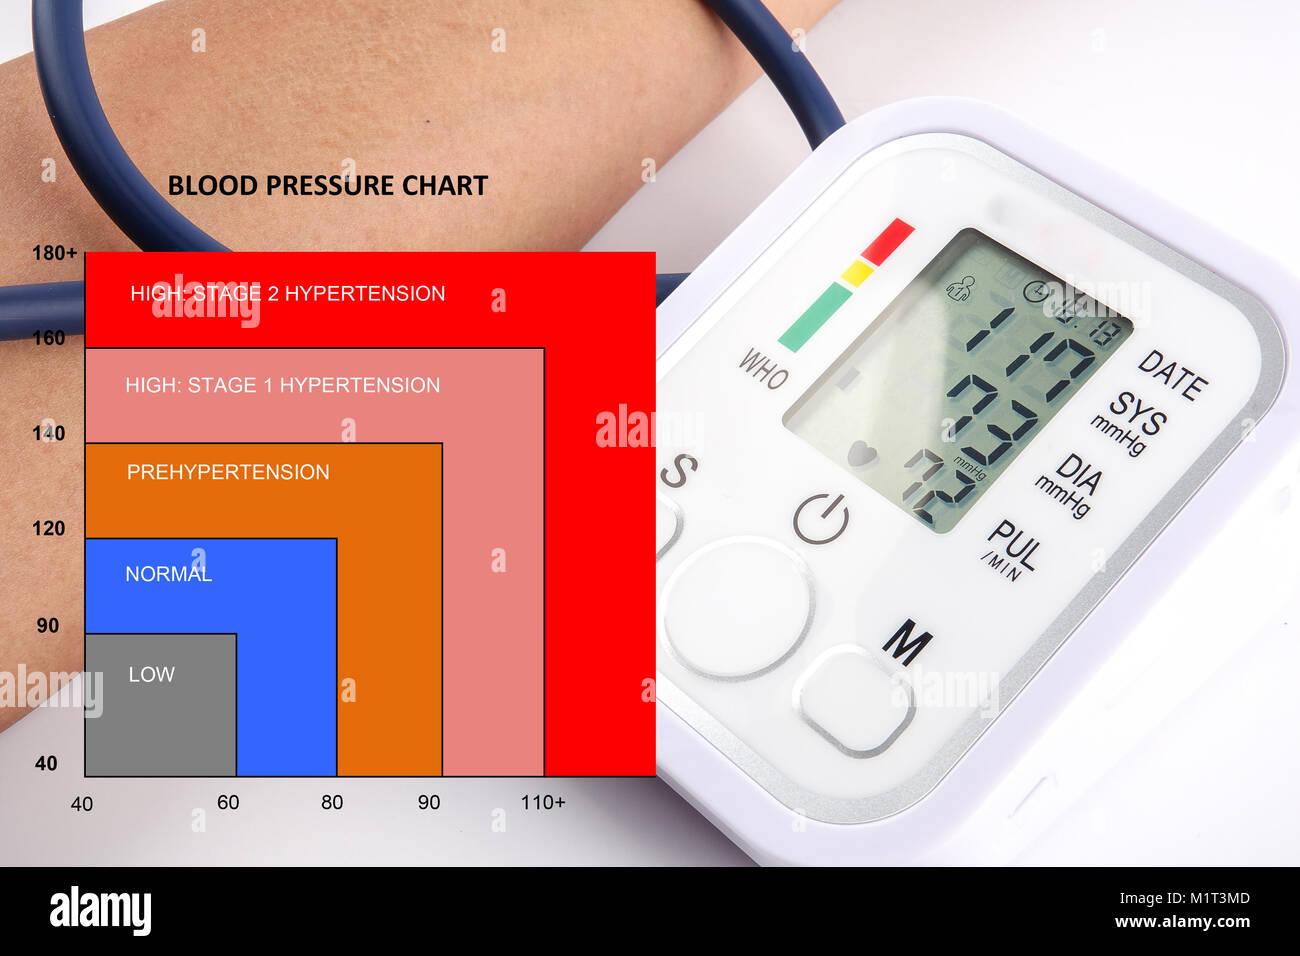 Blood pressure chart with blood pressure meter stock photo blood pressure chart with blood pressure meter geenschuldenfo Choice Image